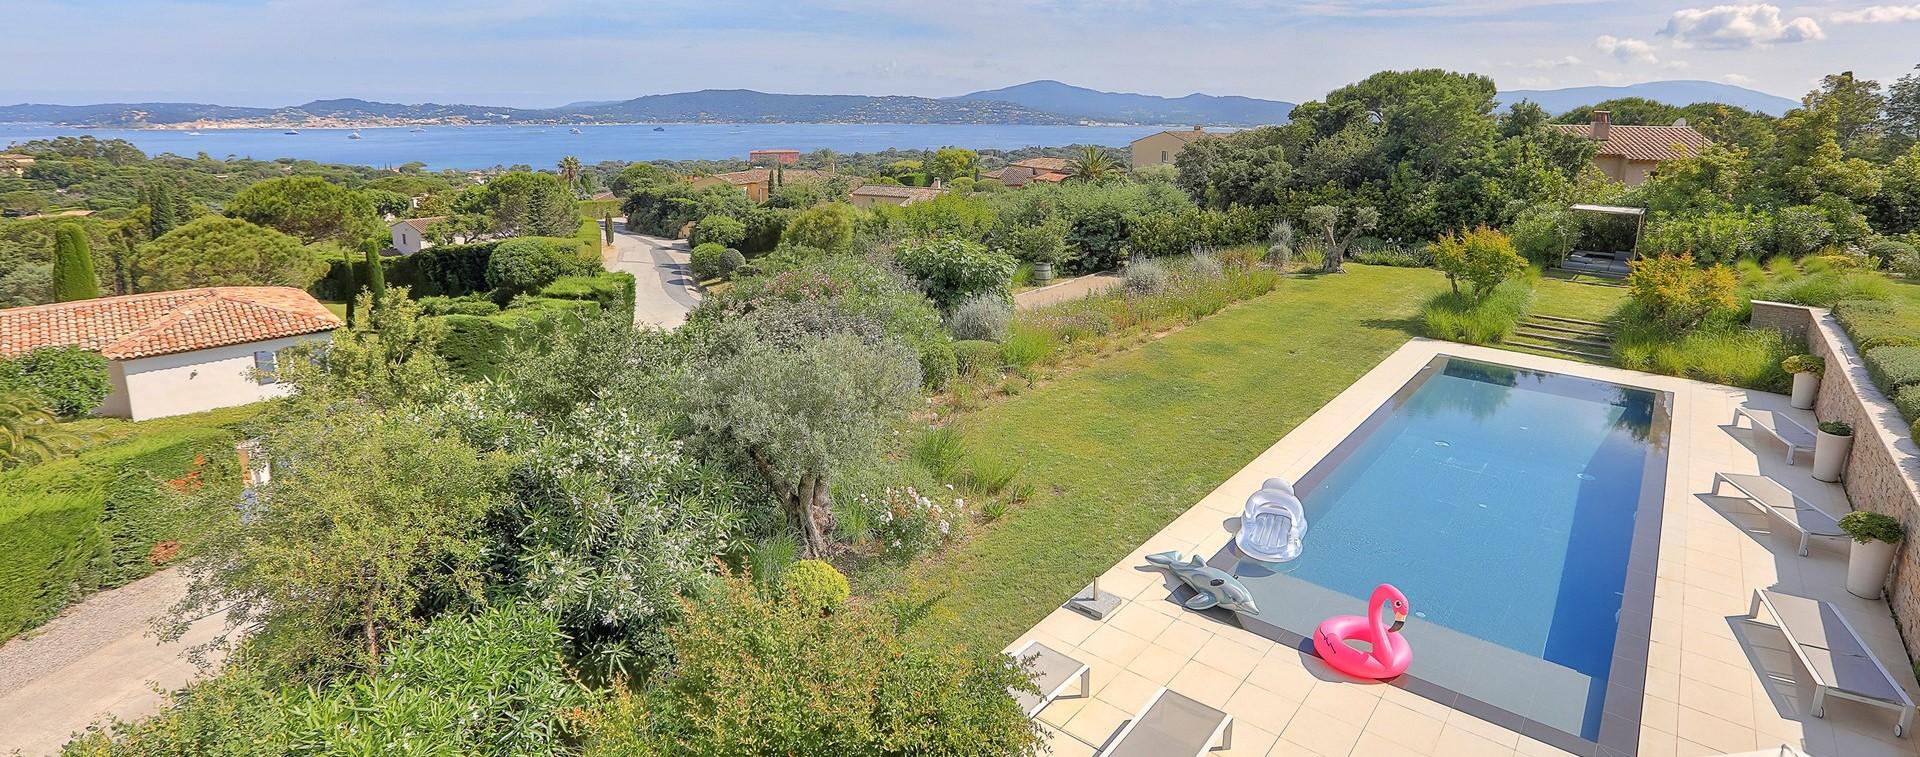 luxury-villa-holidays-cote-d-azur